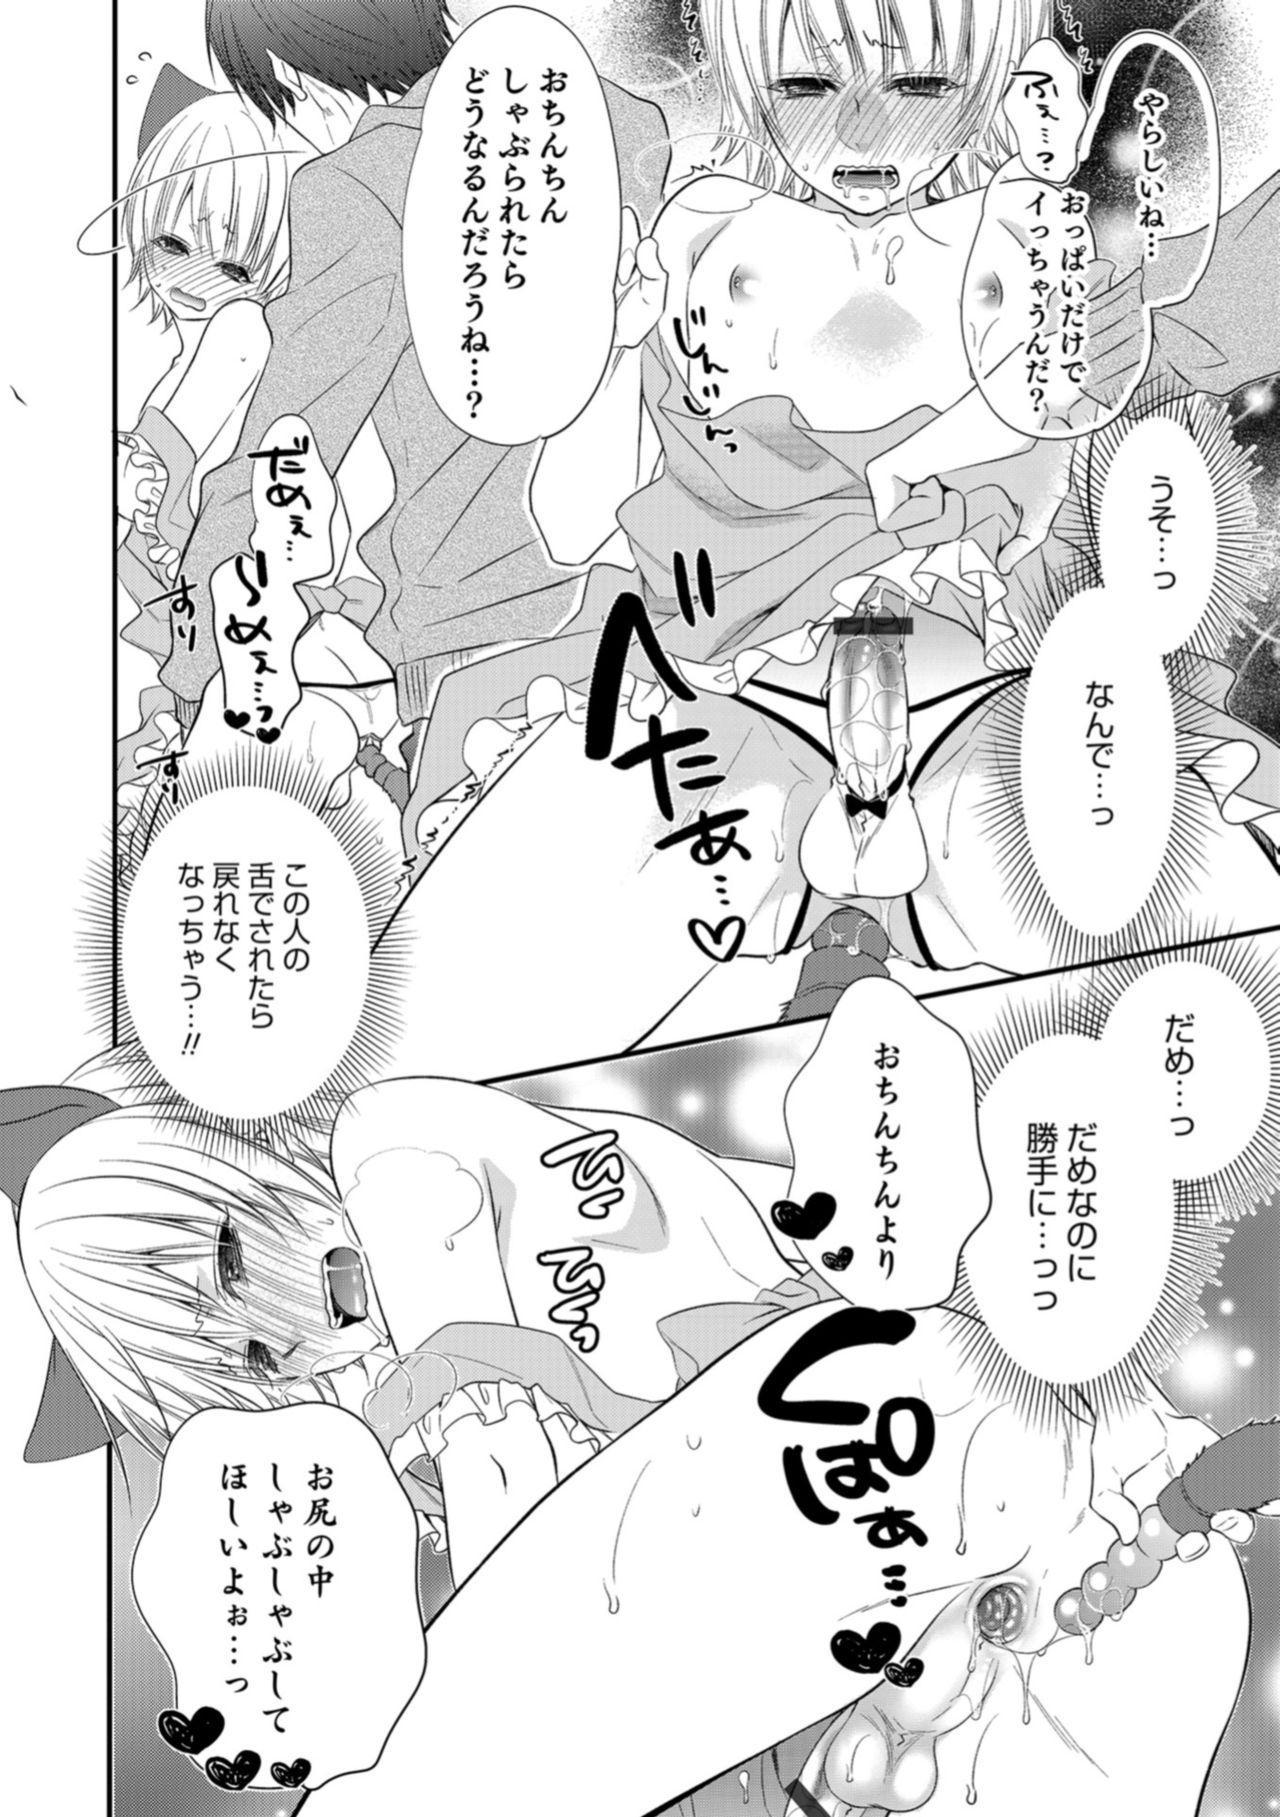 Otokonoko HELL'S GATE #03 111